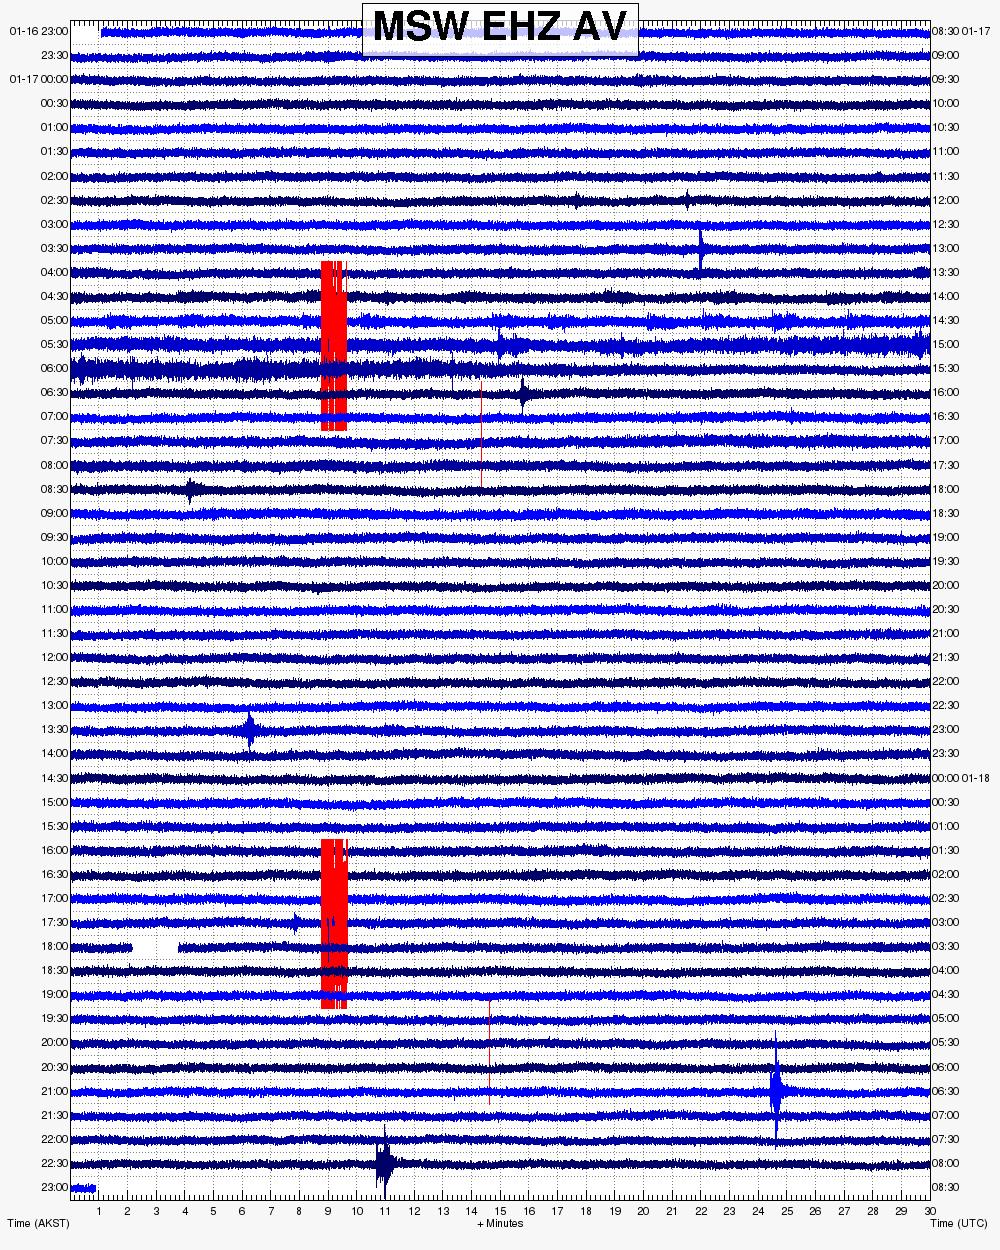 Bogoslof - sismogramme du 17.01.2017 / heures UTC à droite - doc.AVO